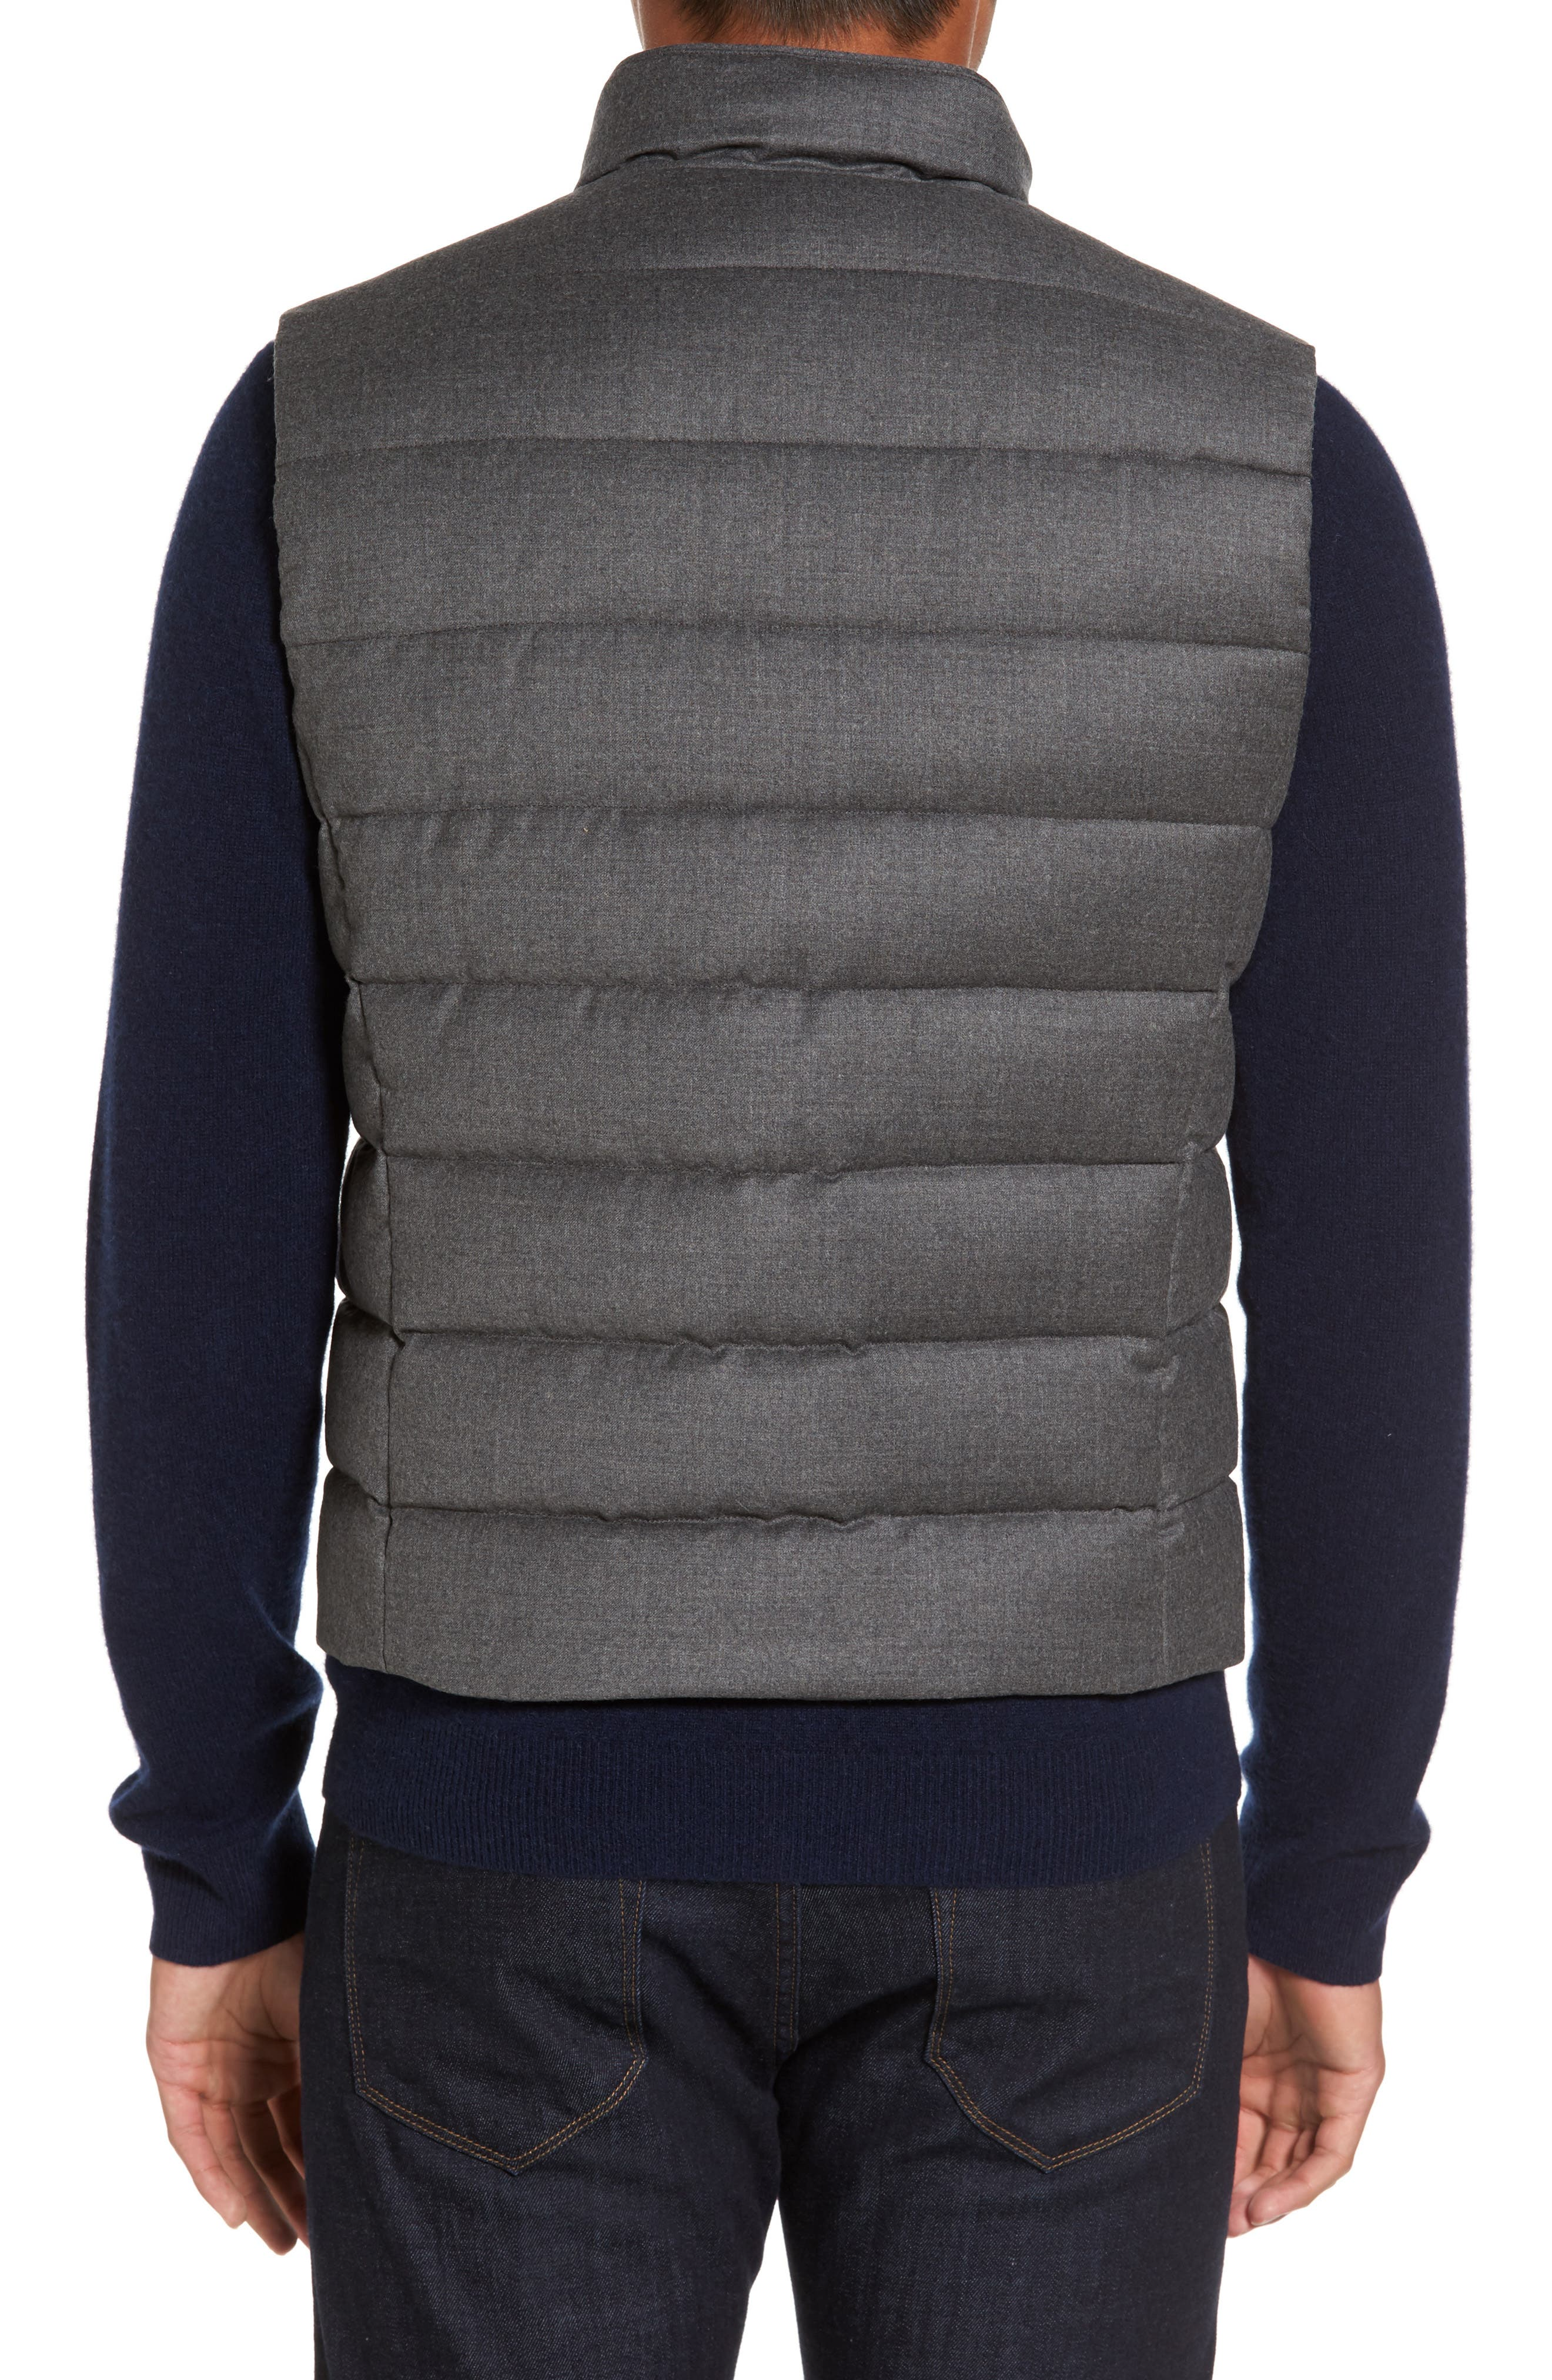 Oliver L Wool & Cashmere Flannel Waterproof Vest,                             Alternate thumbnail 2, color,                             030